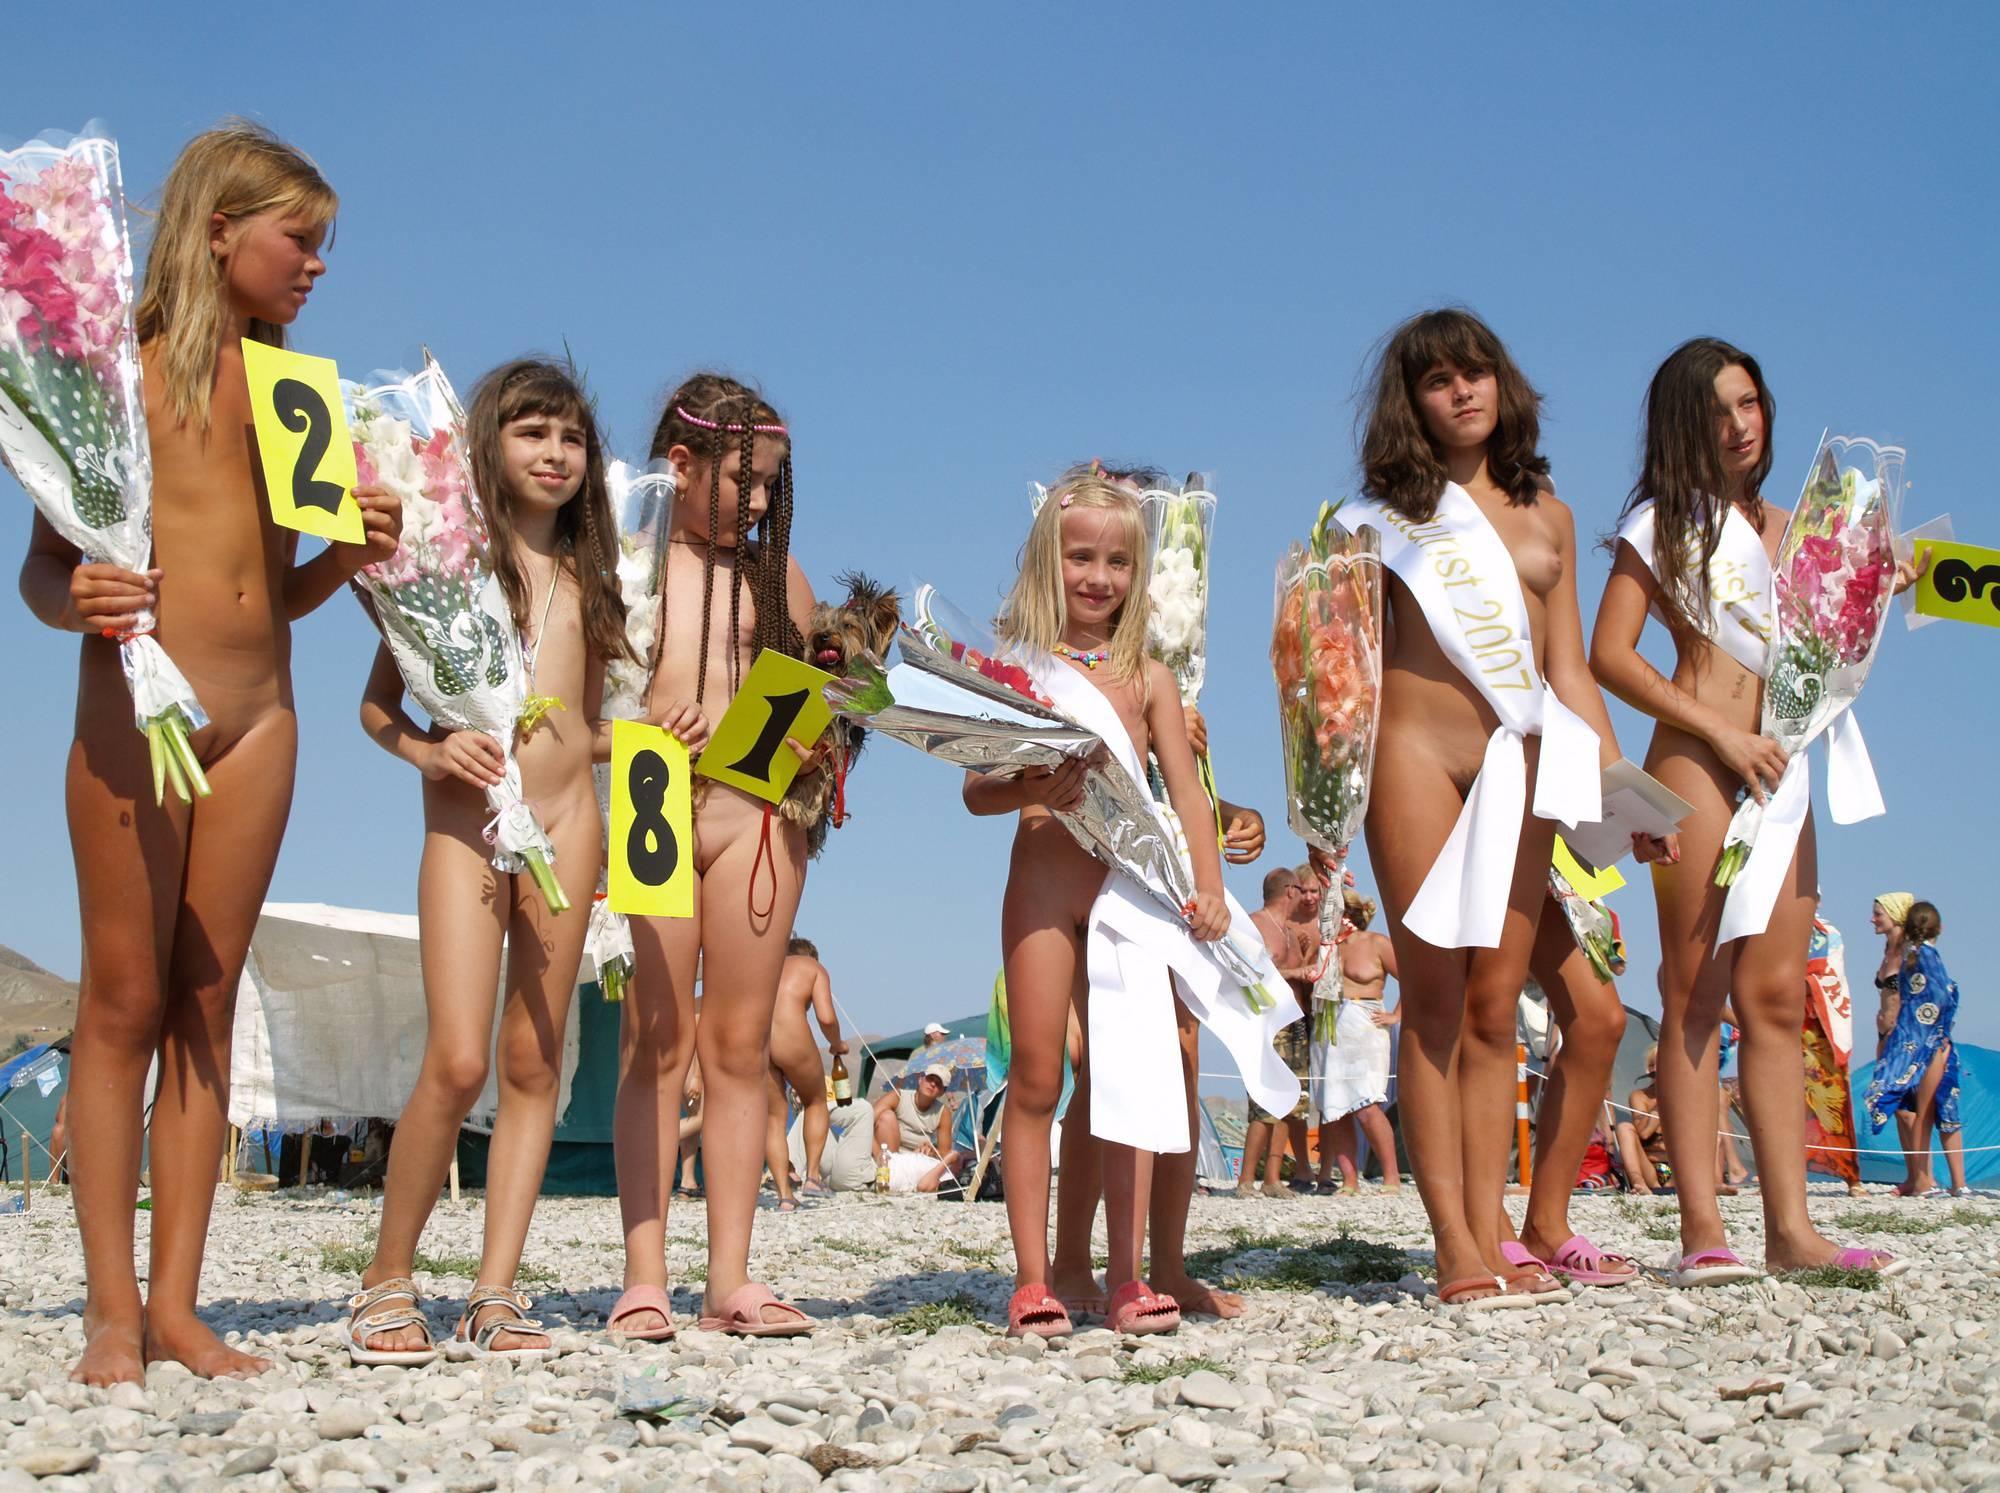 Purenudism Images Nude Jr Kids Pageant - 2